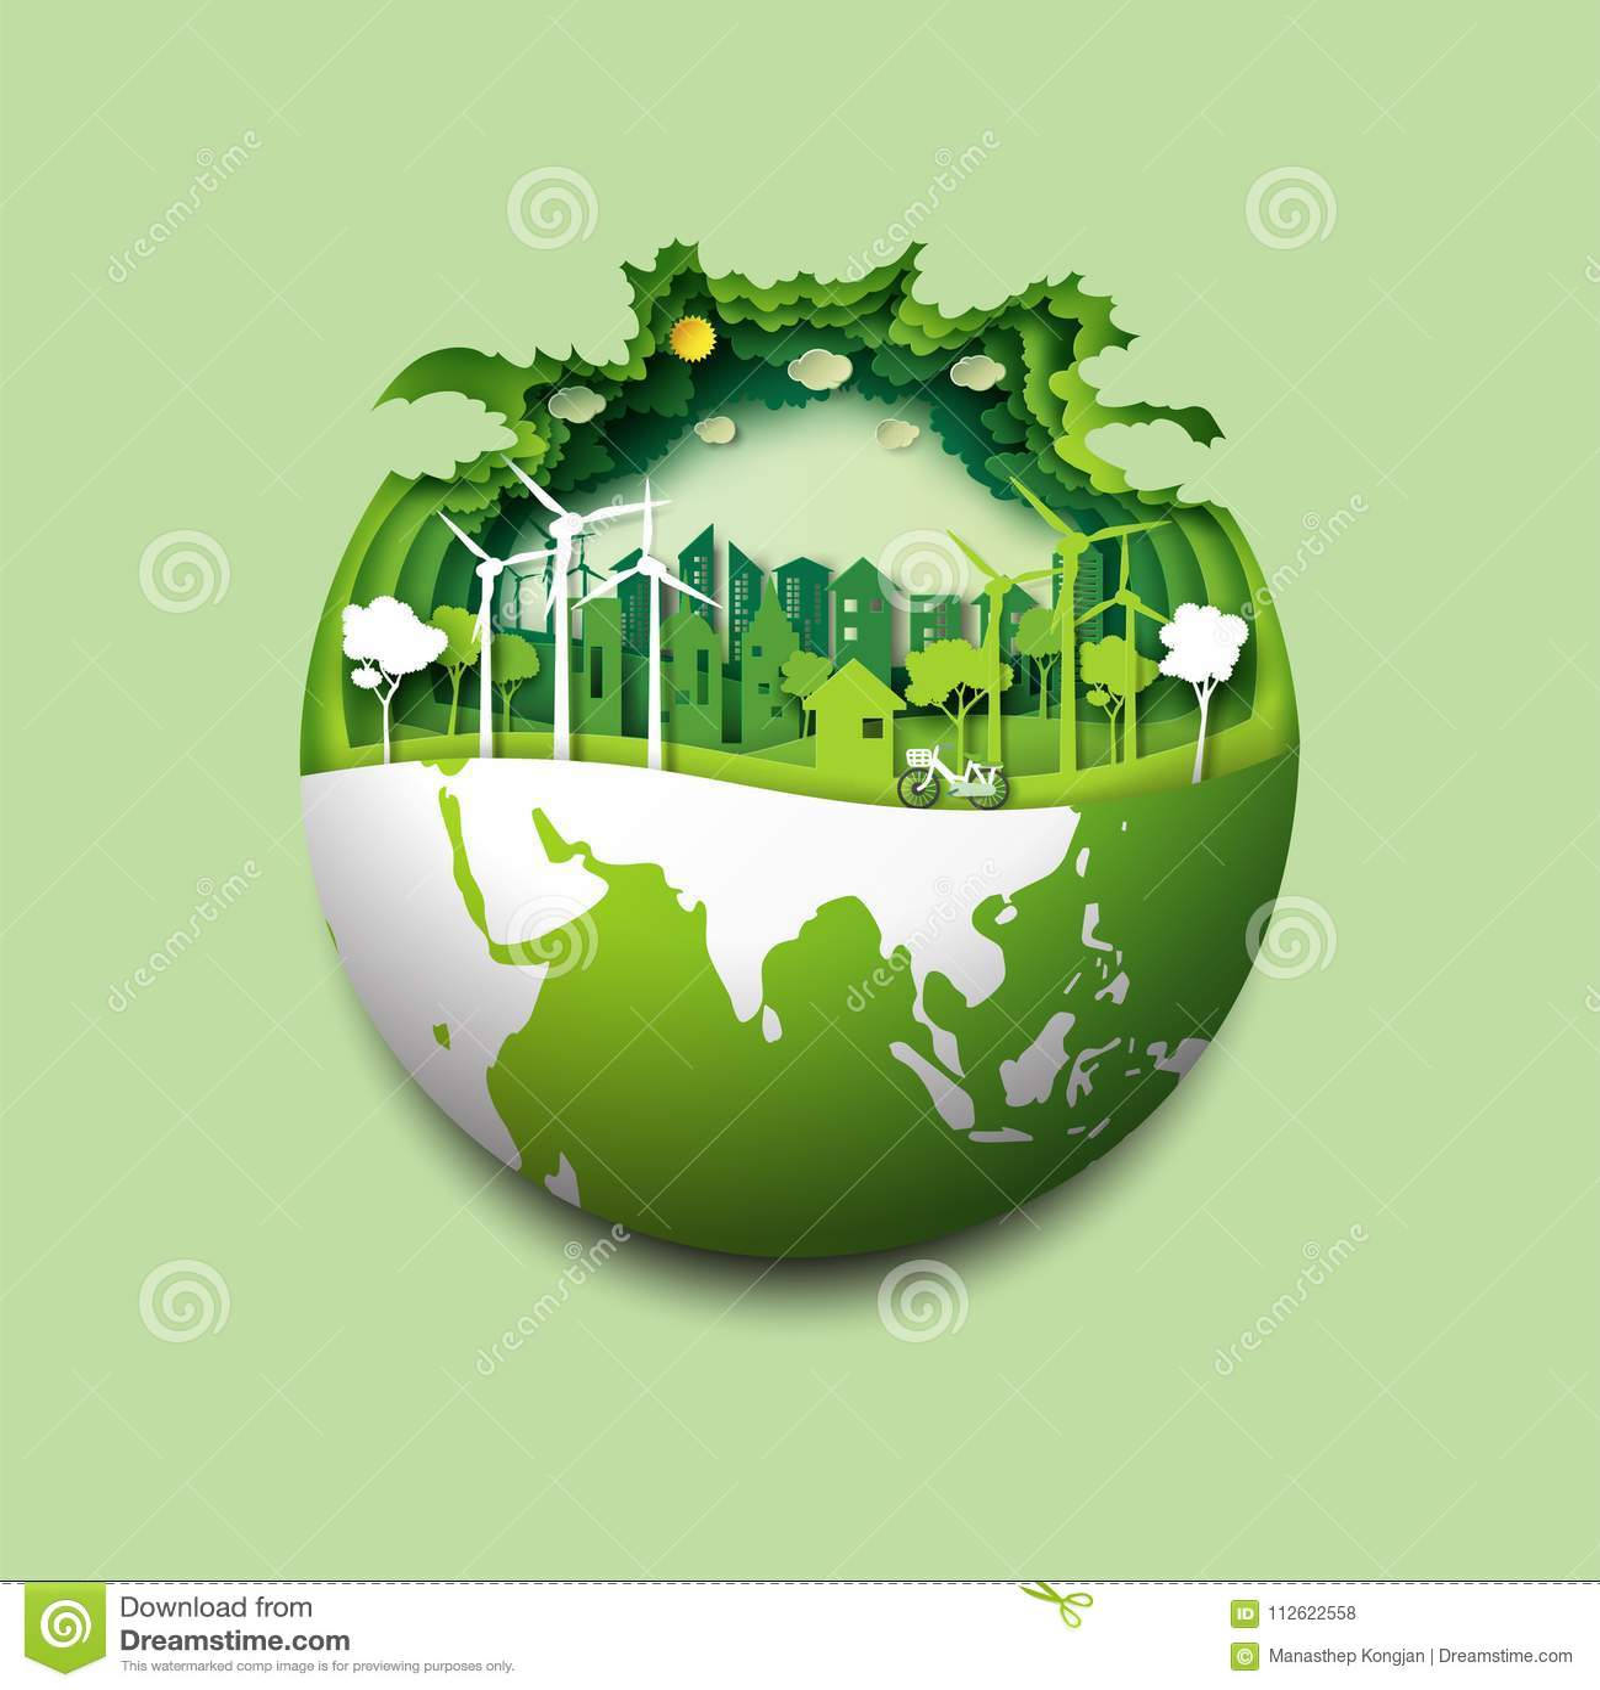 Environmental Concept Earthfriendly Landscapes